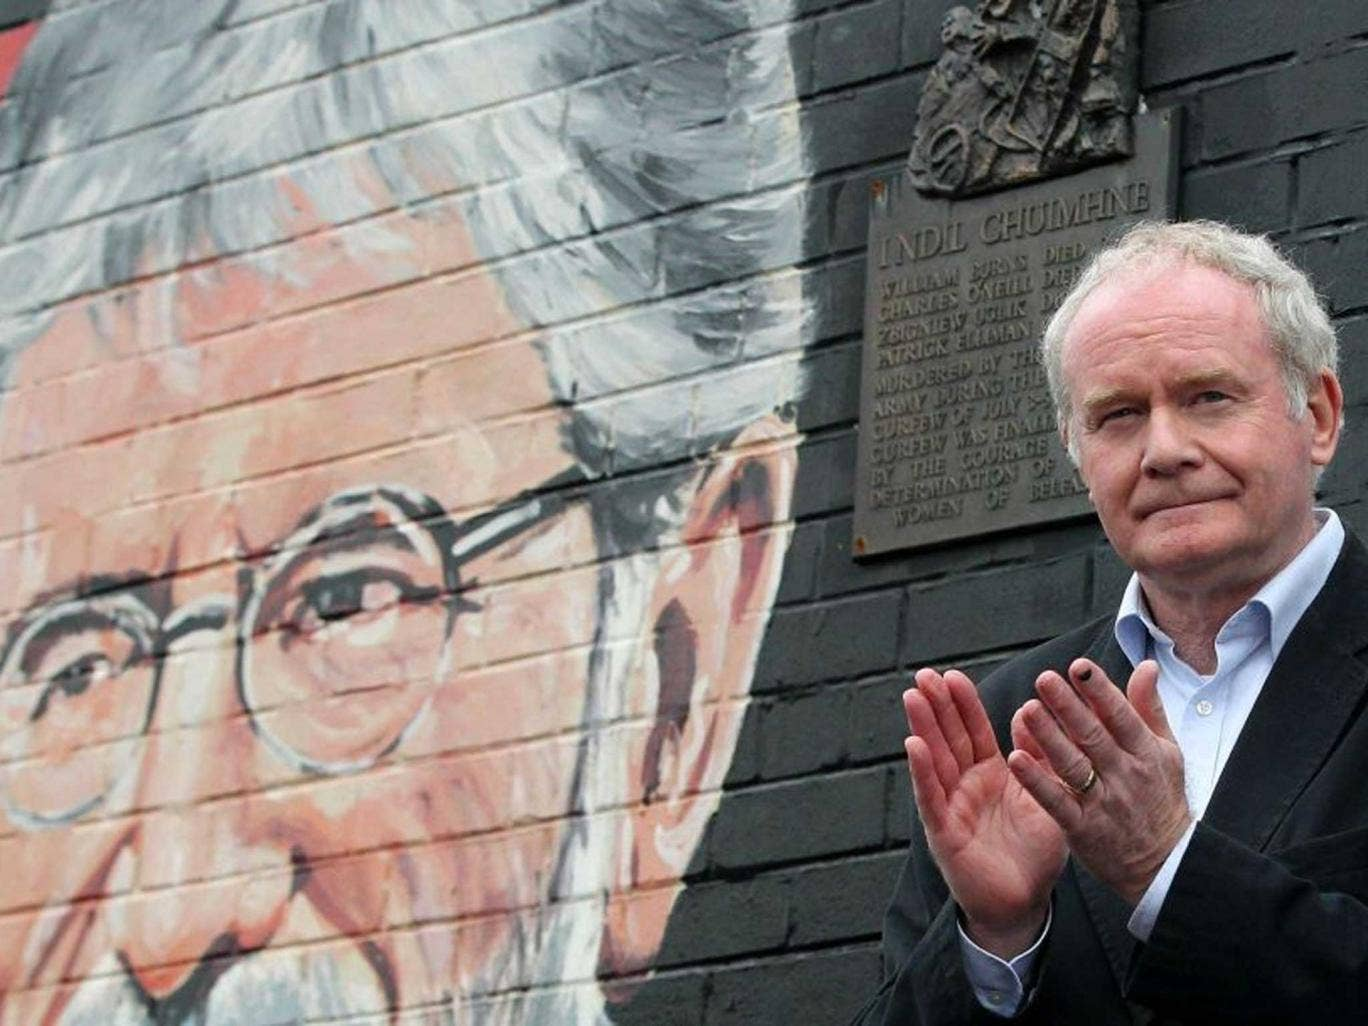 Deputy Martin McGuinness applauds the crowd as he speaks against a backdrop of a mural of detained Sinn Fein leader Gerry Adams